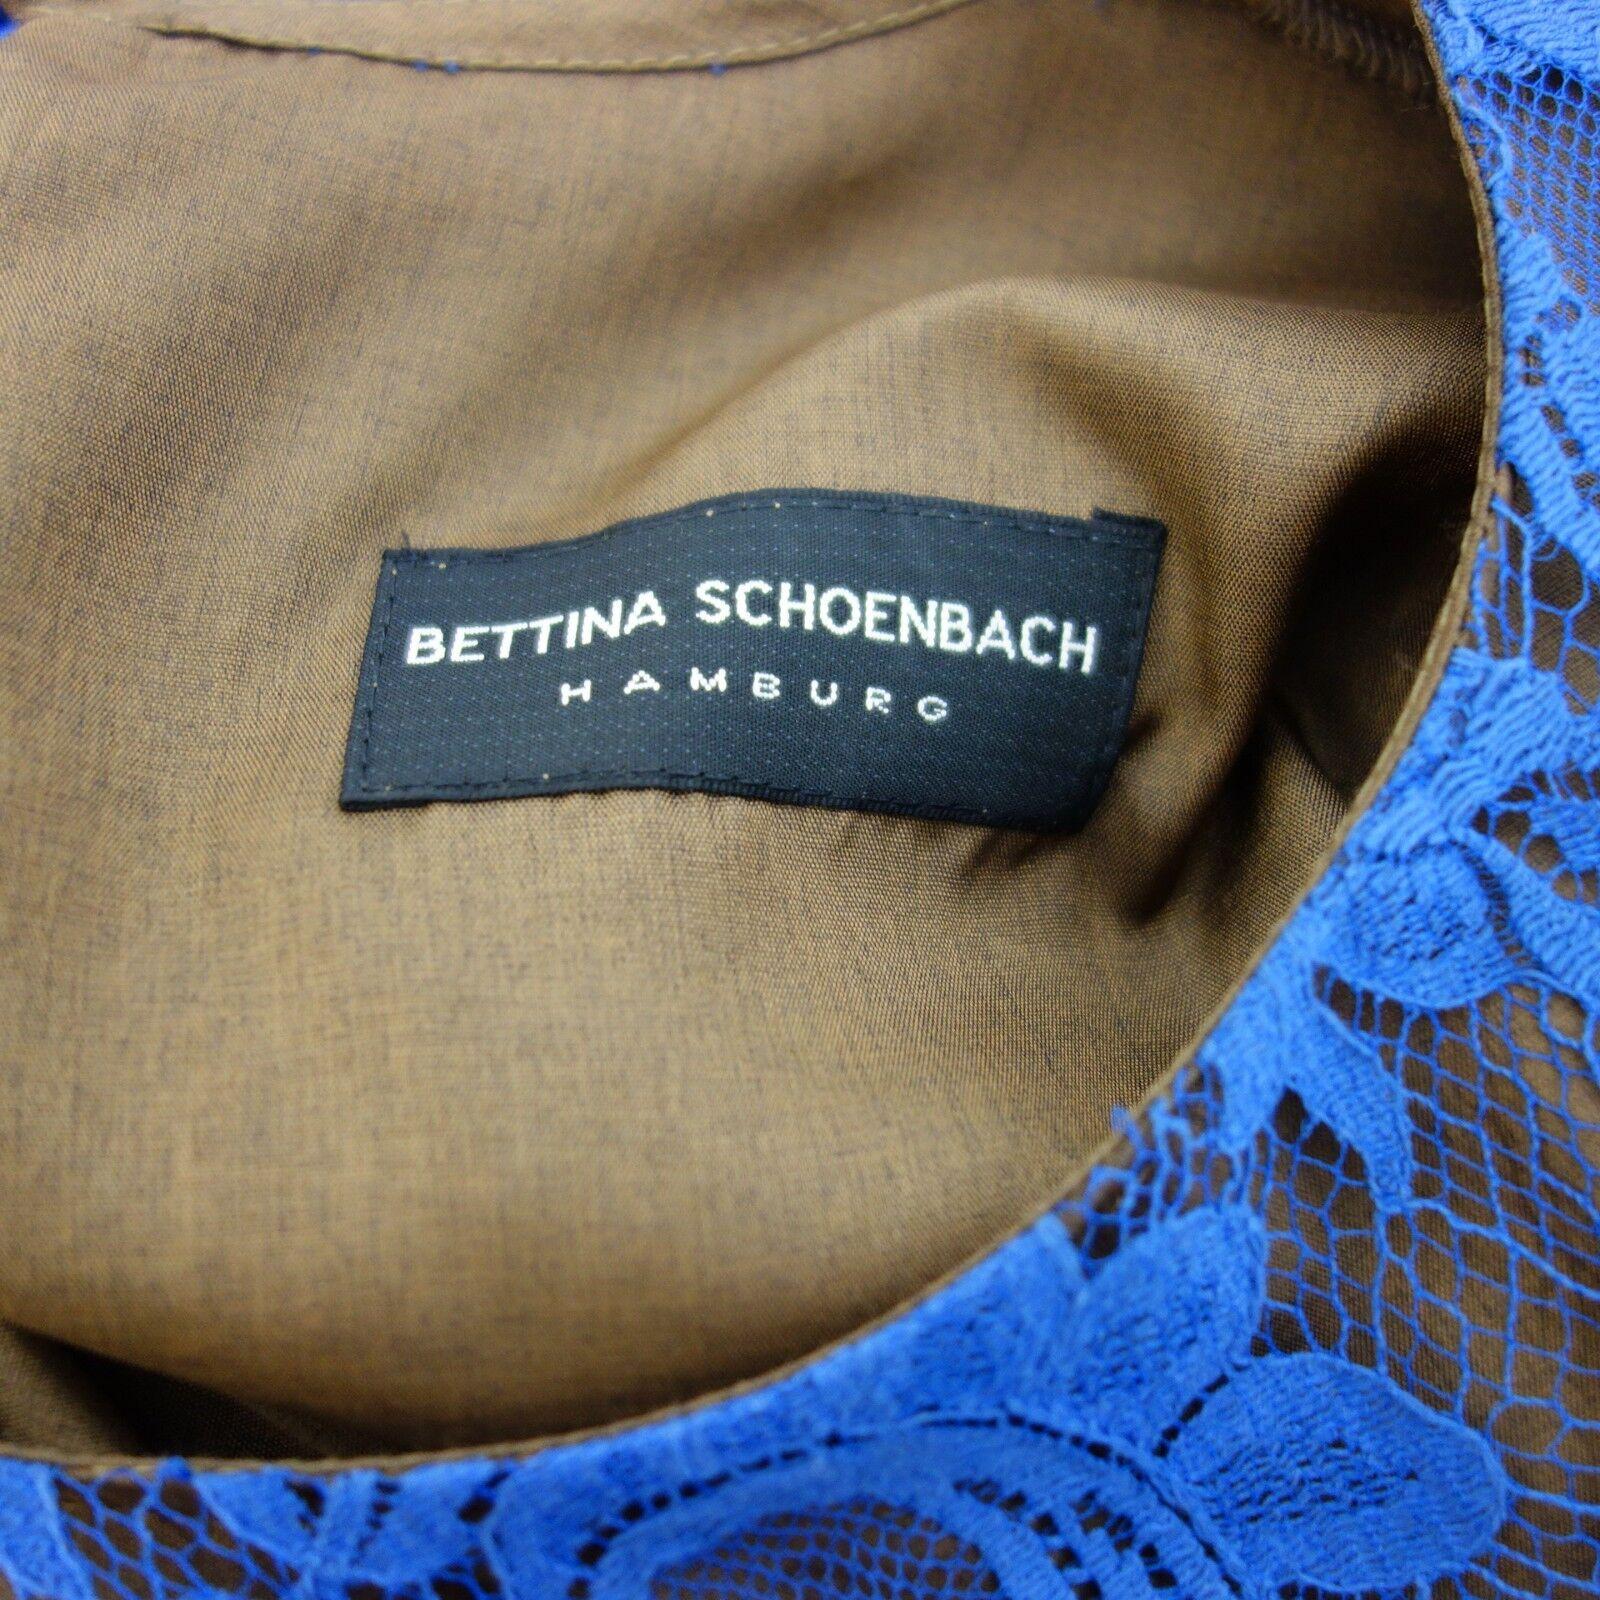 Bettina Schoenbach Blusa Donna Maglia Gr 36 Marronee Blu Pizzo Pizzo Pizzo Seta Lana 9b8659